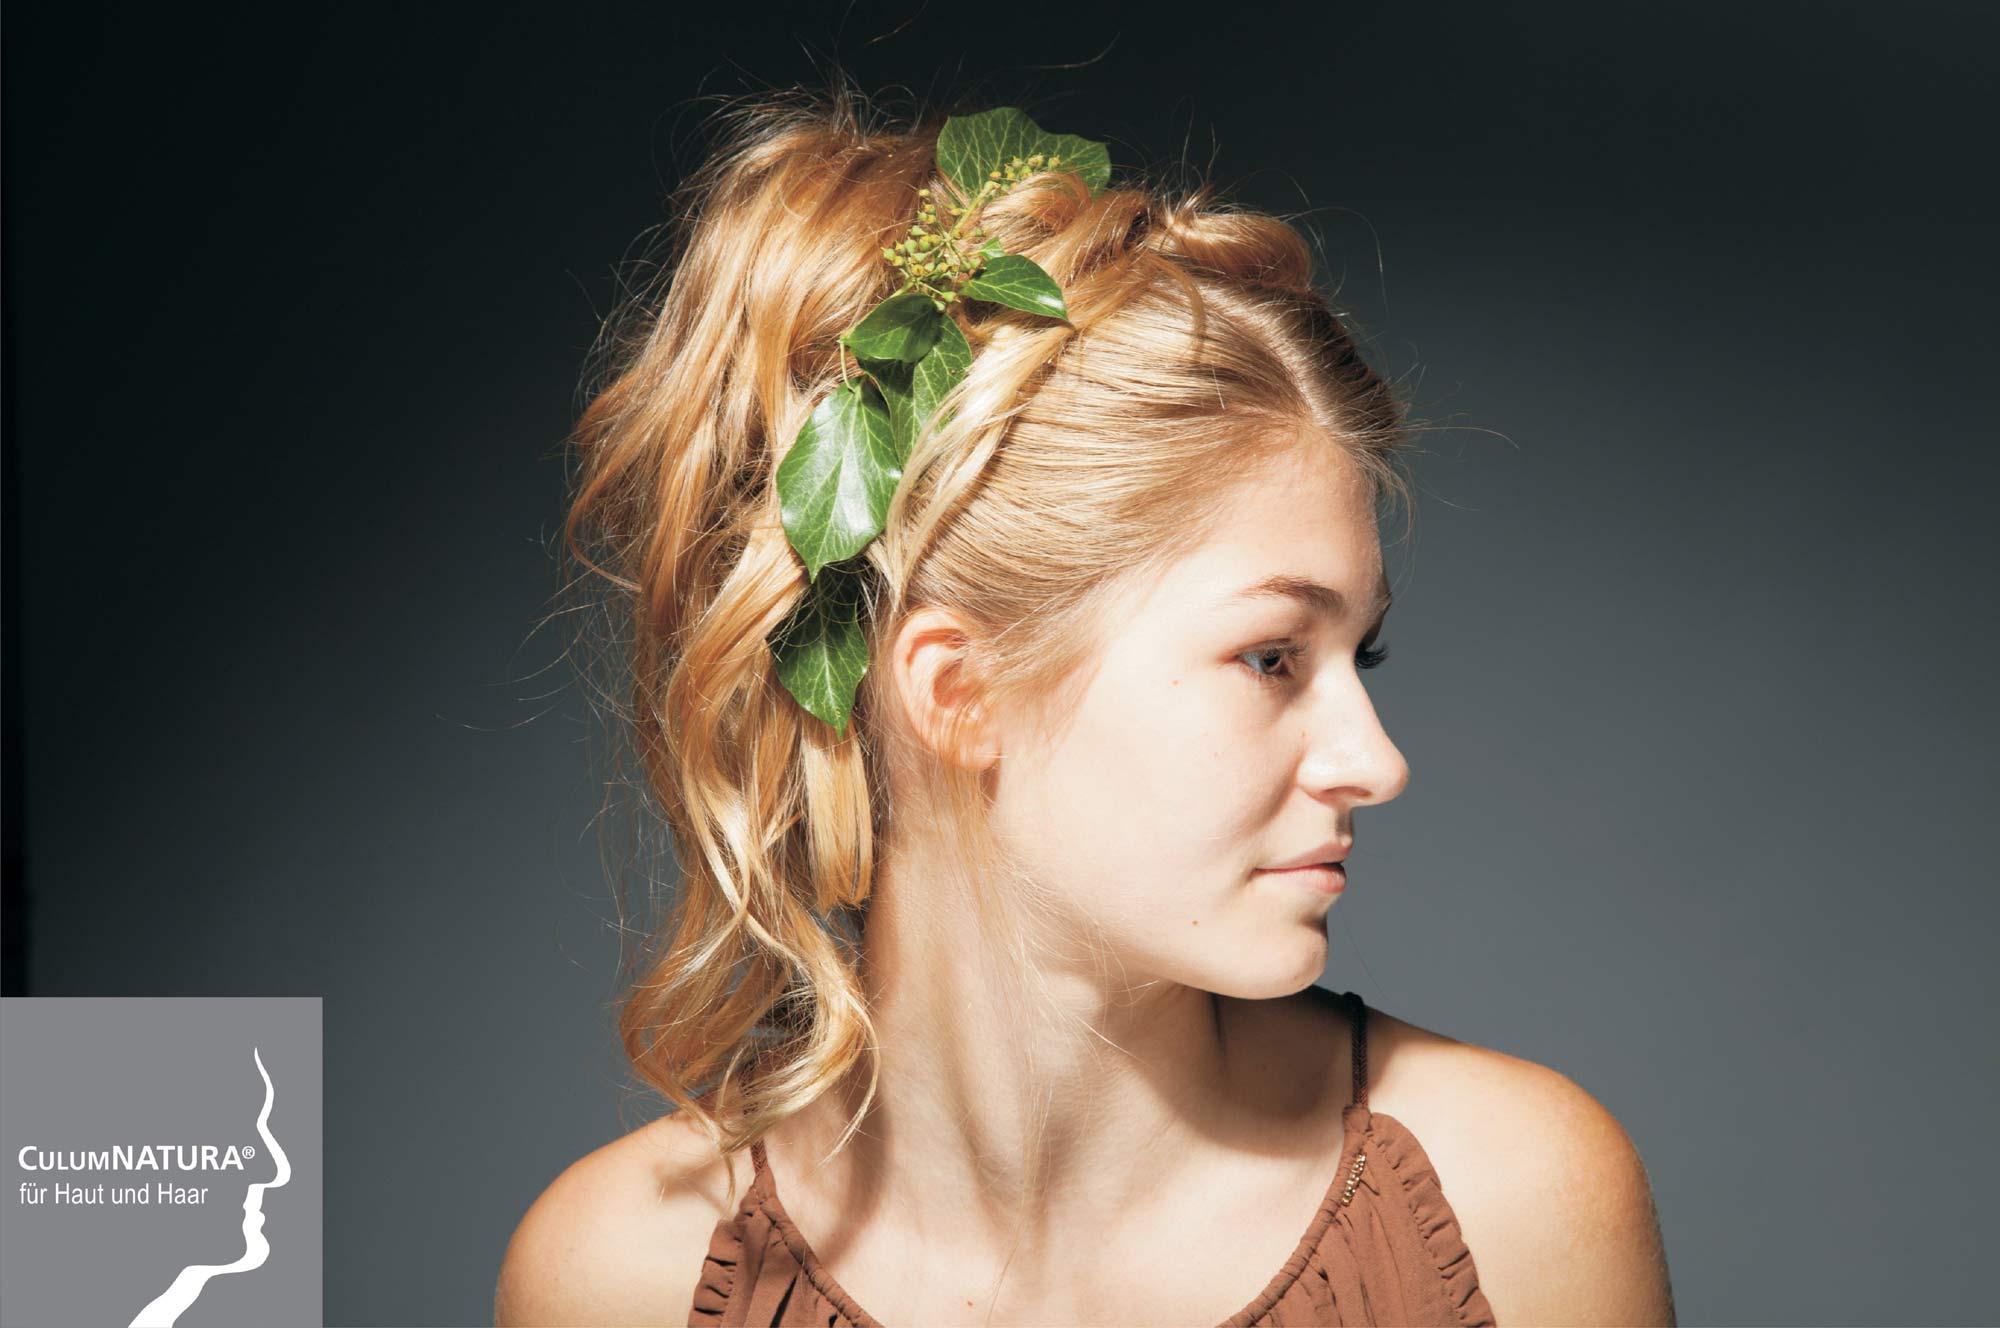 Culumnatura Hair